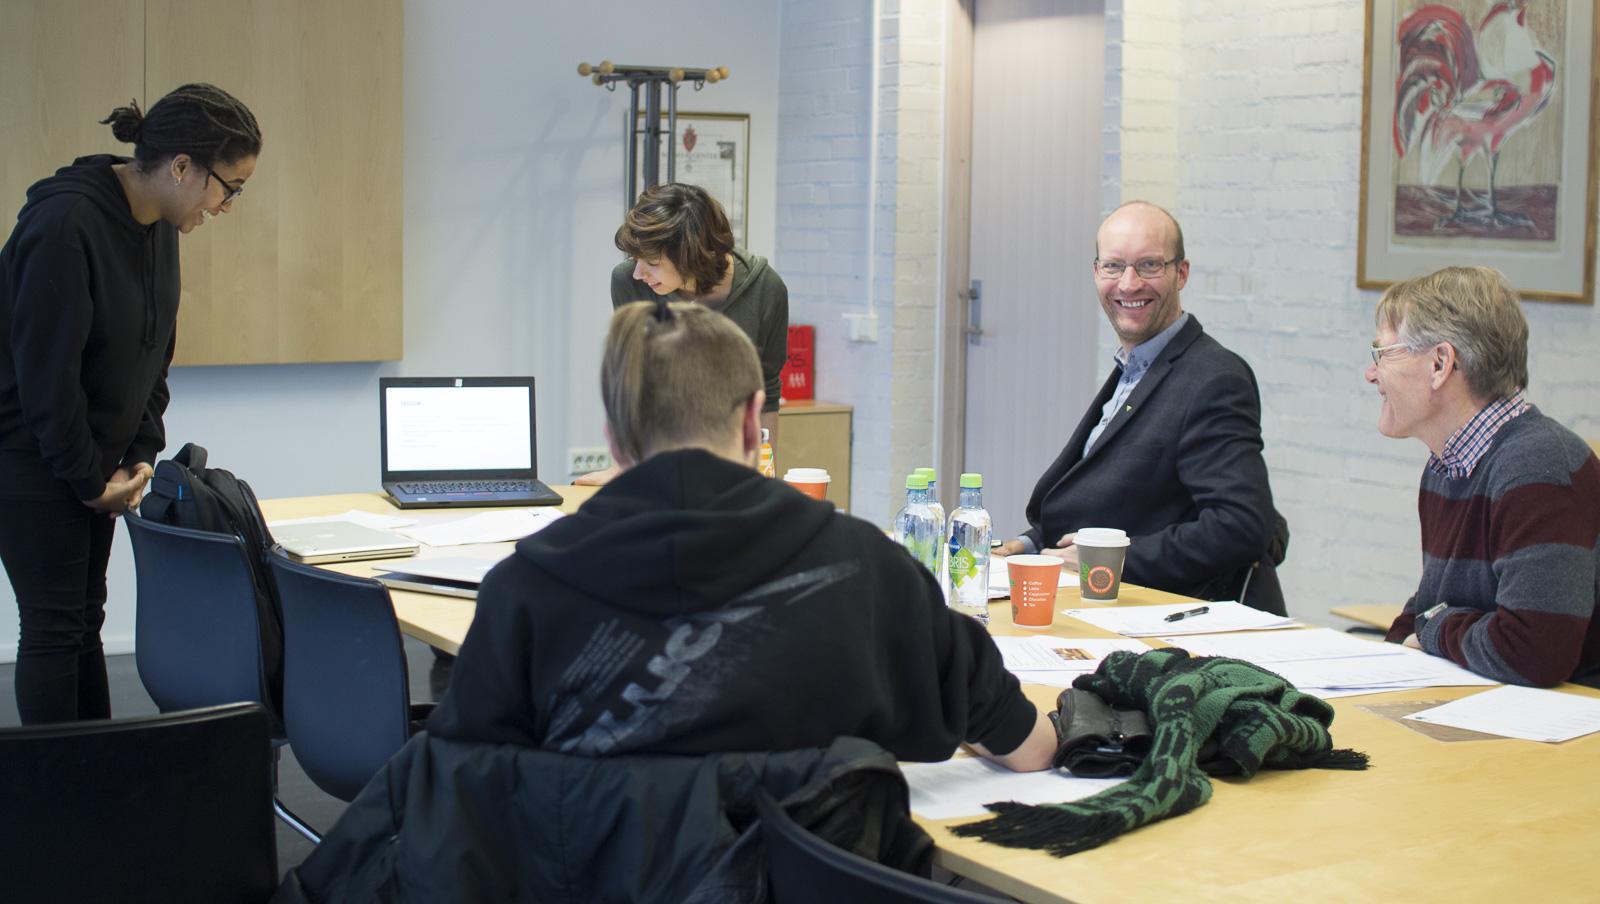 Ekstern jury: Petter Skotland, Erik Vea, og Andreas (praktikat på Sørum bibliotek)